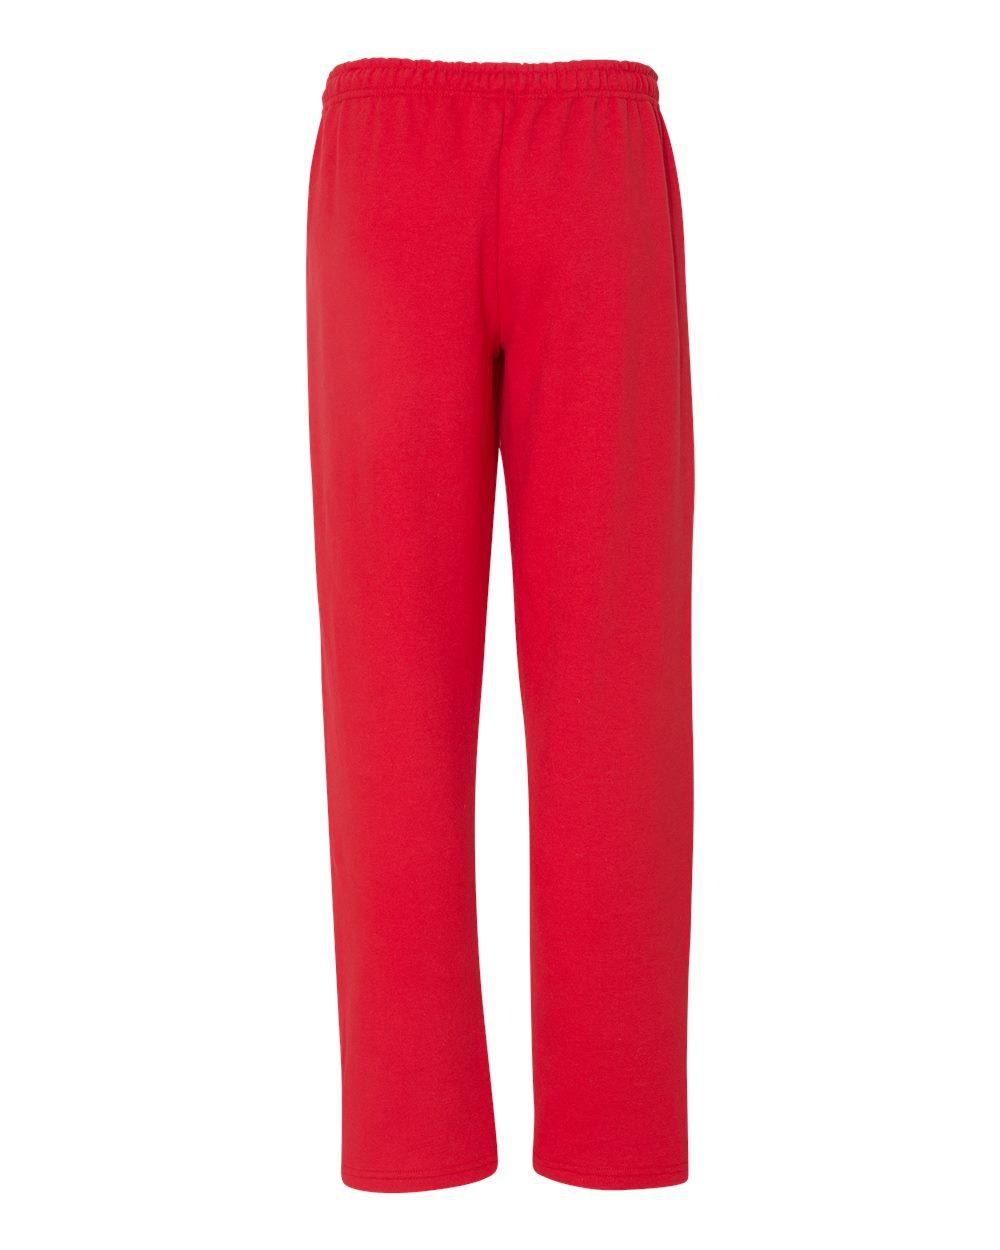 3814fea85433 Gildan Men s Heavy Blend Open Bottom Sweatpants With Pockets G183 S ...